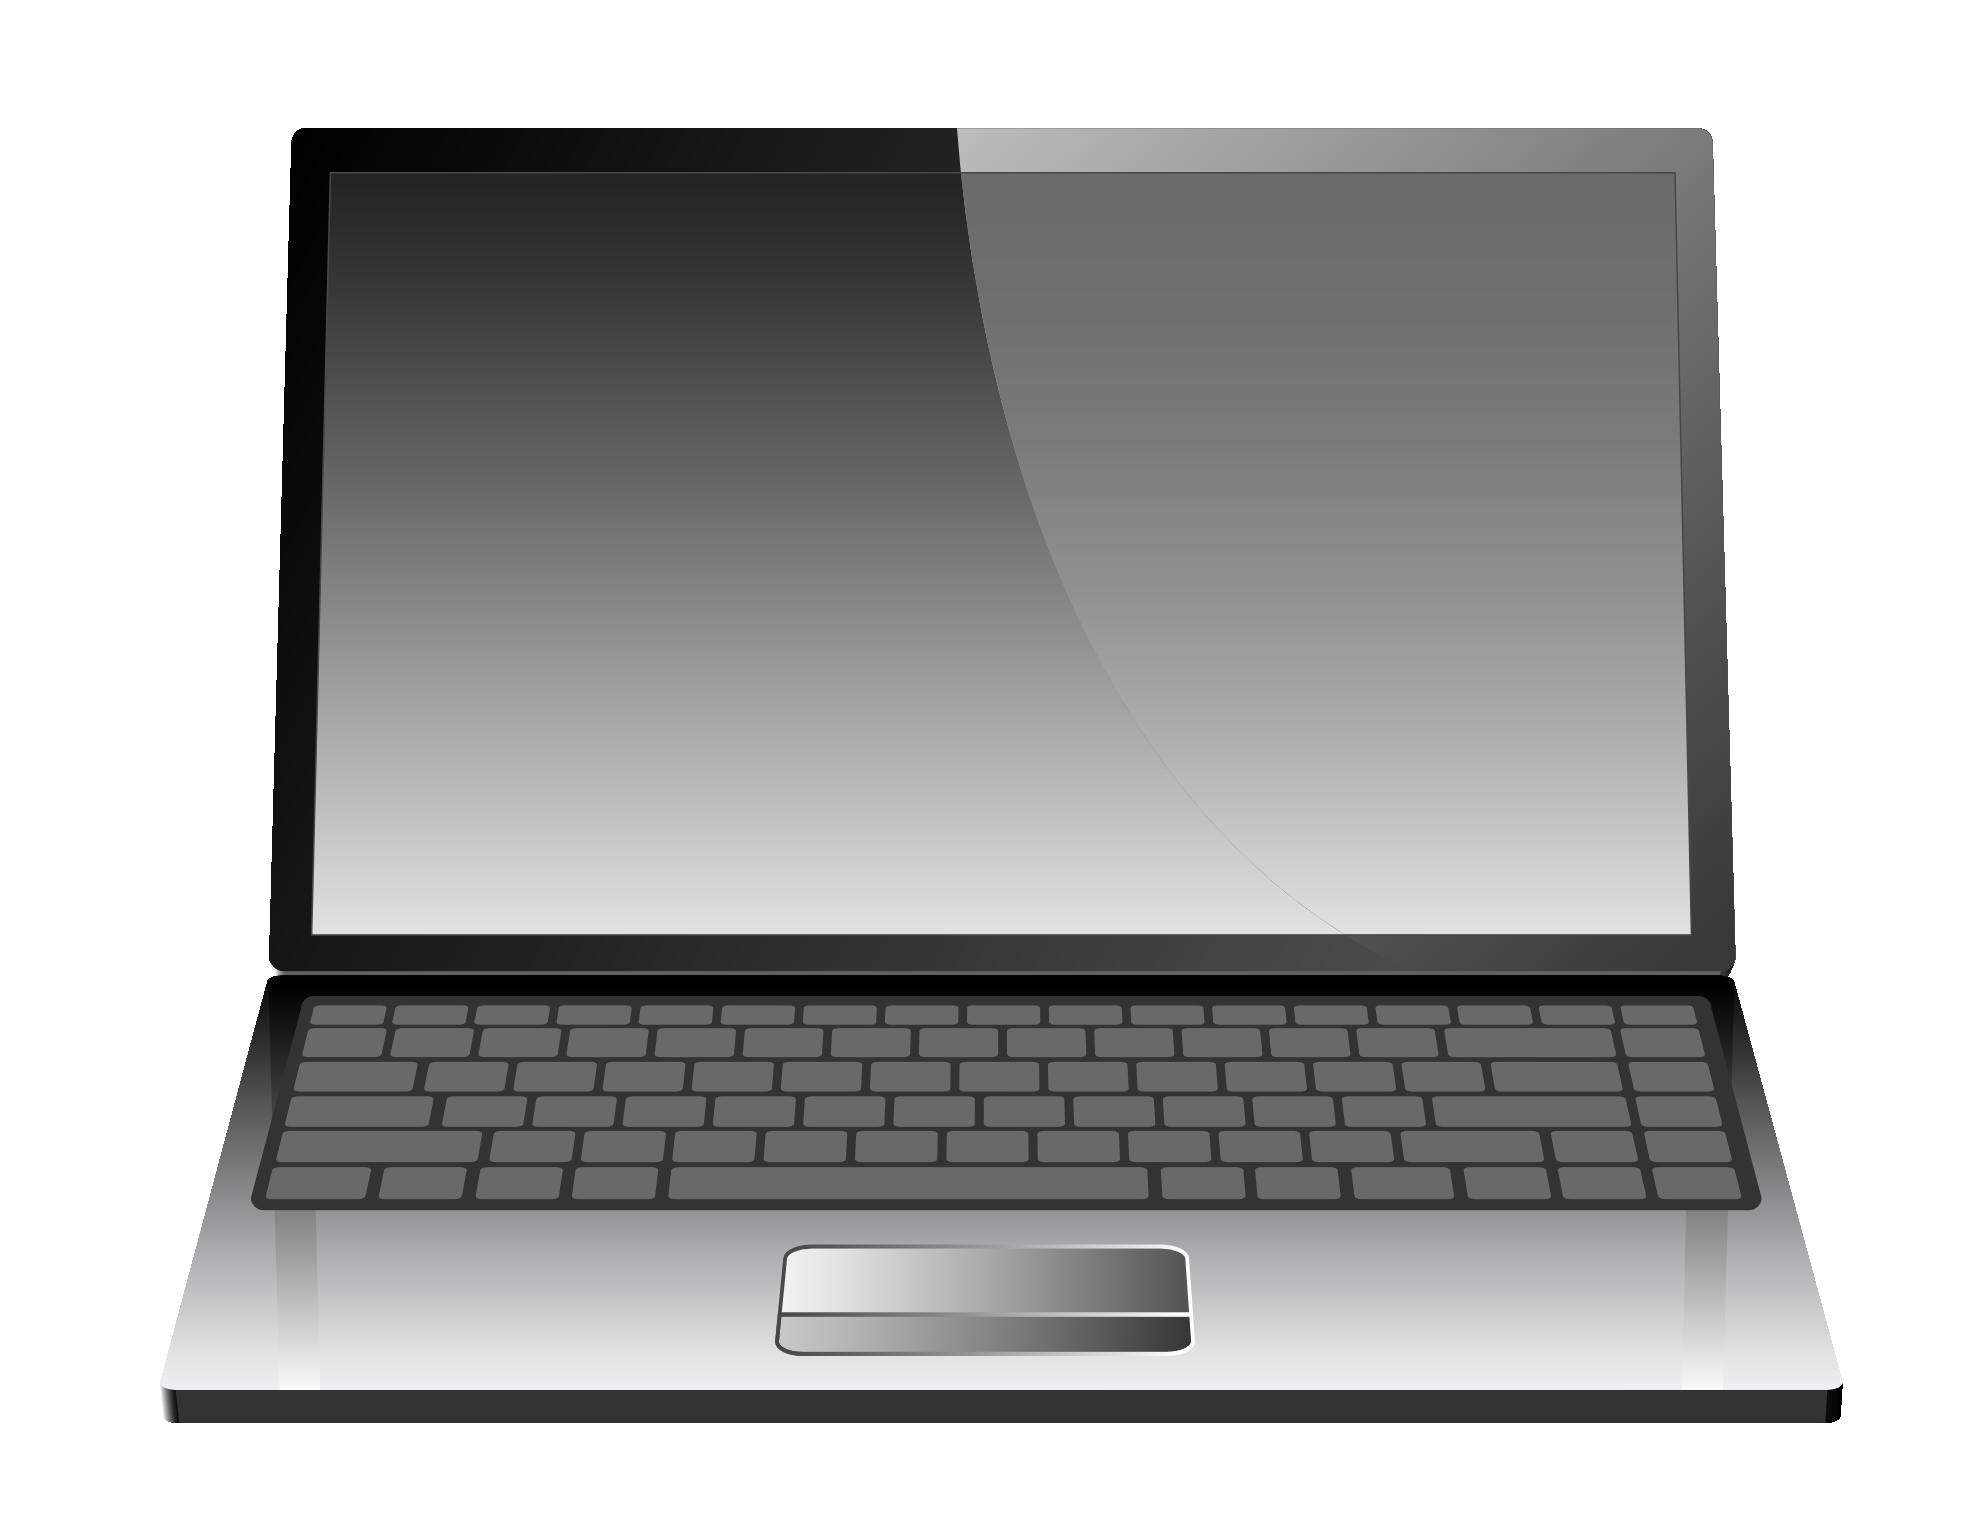 clip art transparent download Laptops PNG images